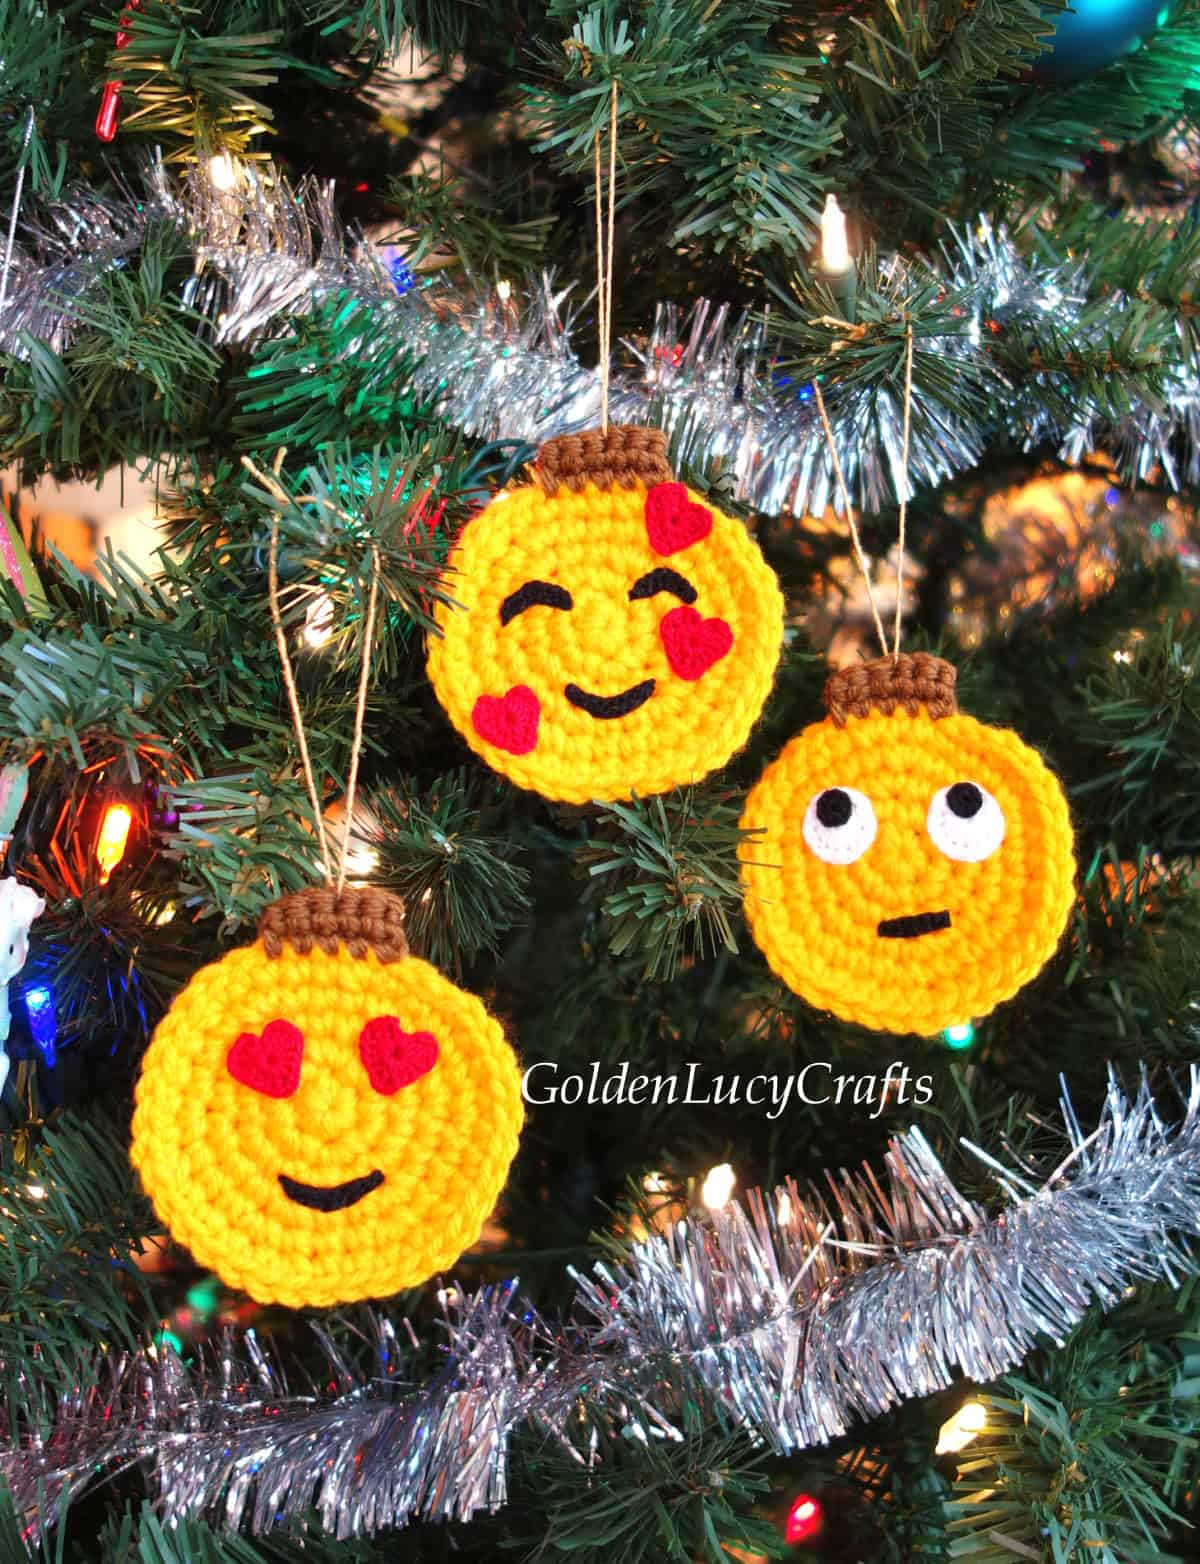 Crochet emoji ornaments hanging on the Christmas tree